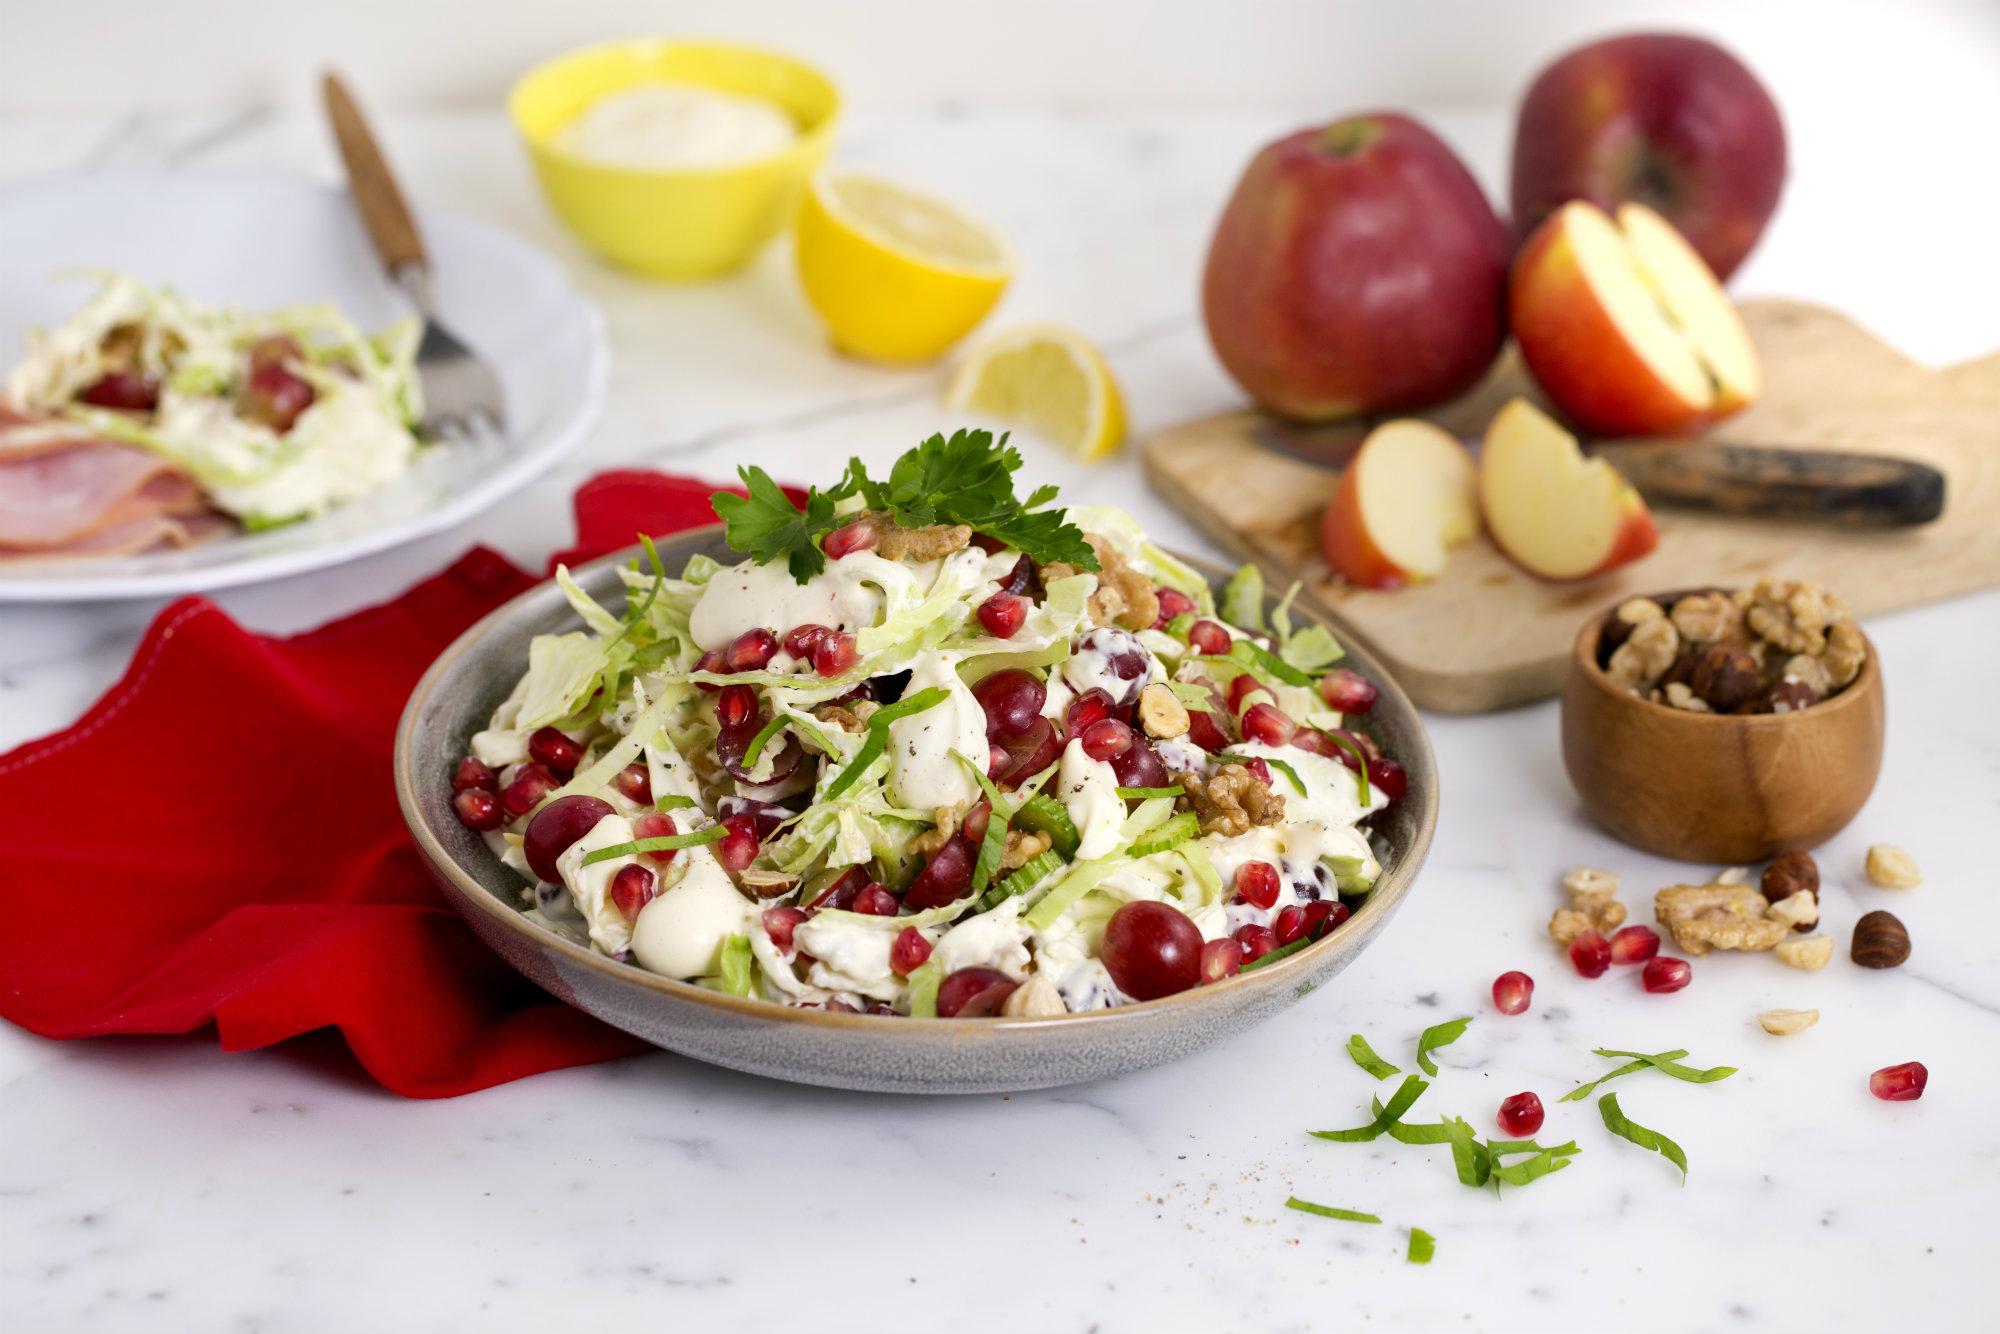 waldorfsalat med granateple